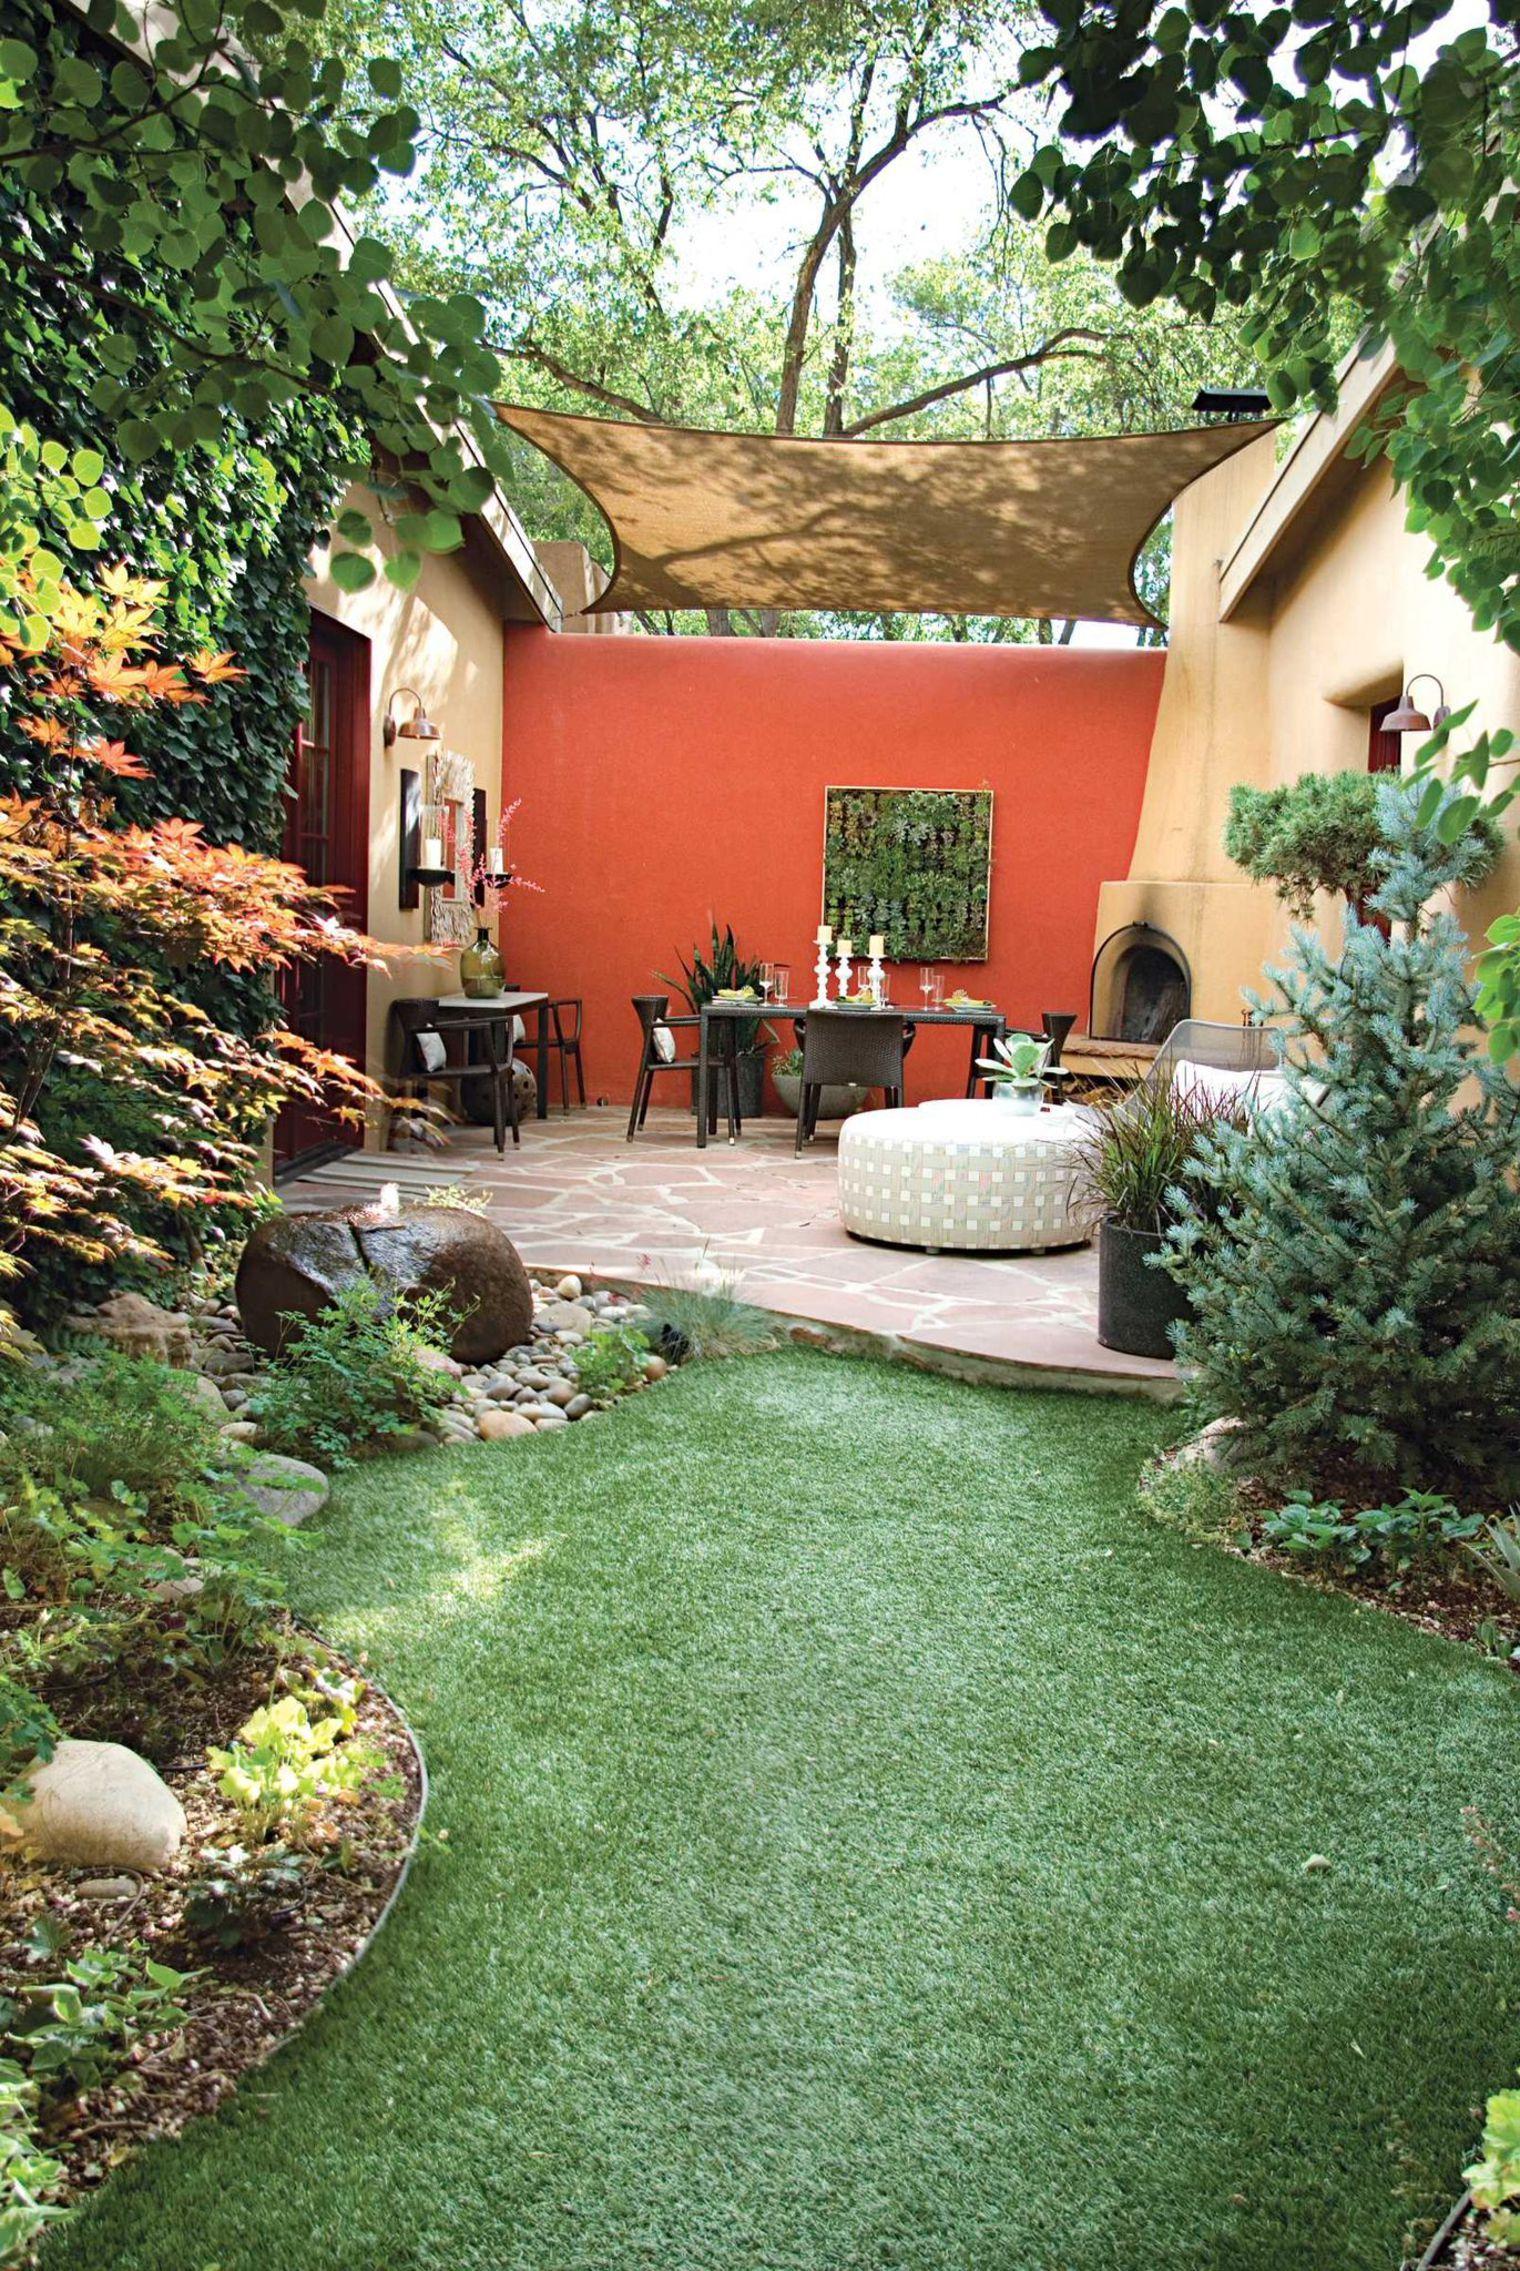 Petit Jardin 8 Amenagements Reperes Sur Pinterest Amenager